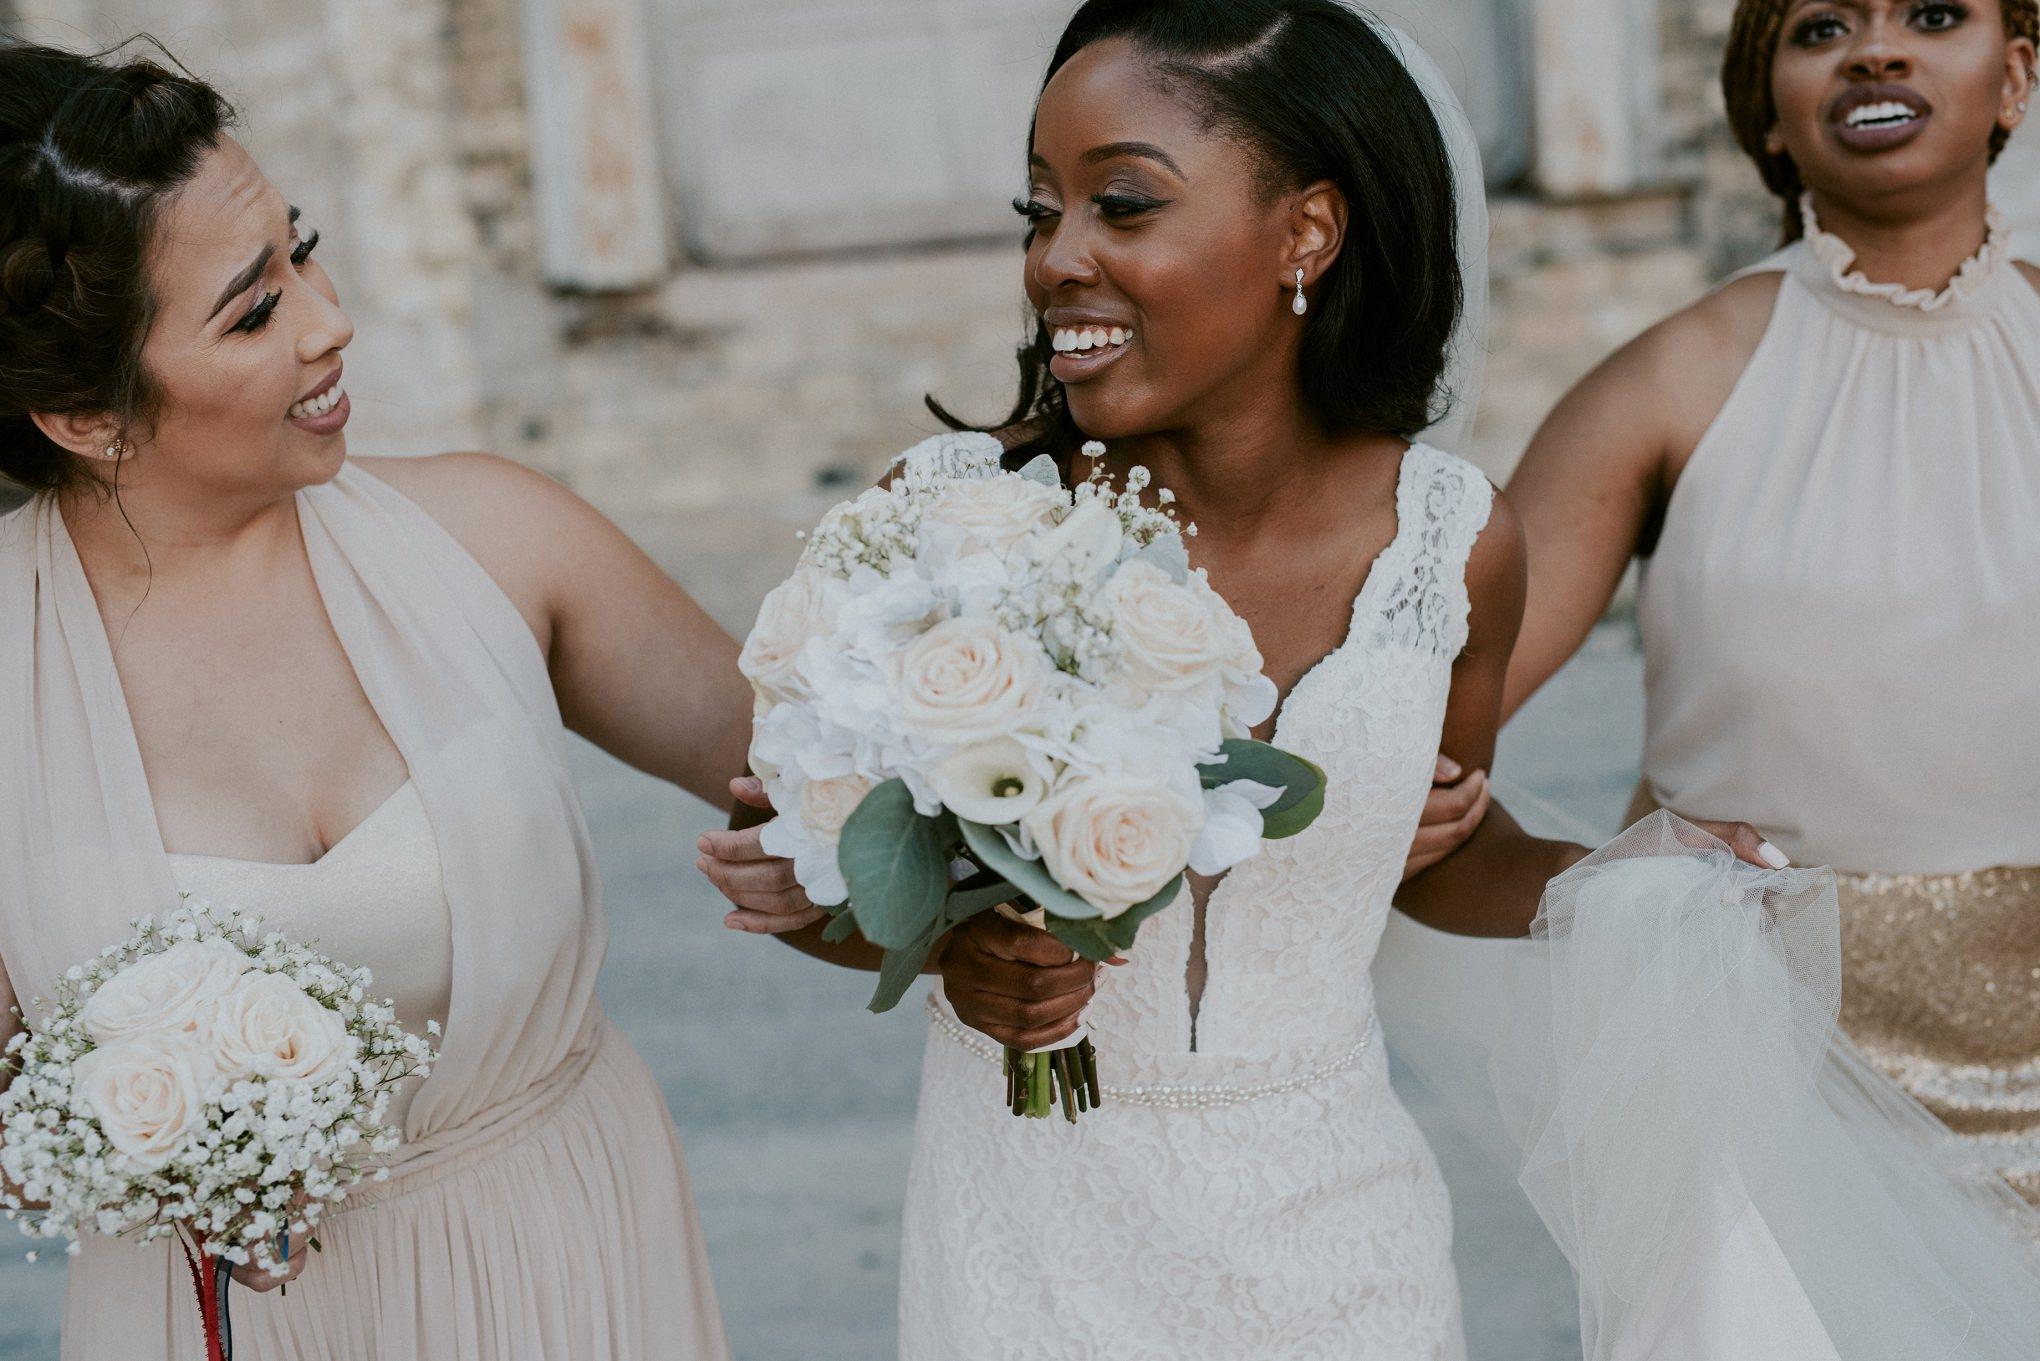 Gold Bridesmaid Dress, Milwaukee Wedding photographer, Downtown Milwaukee Wedding, Married in Milwaukee